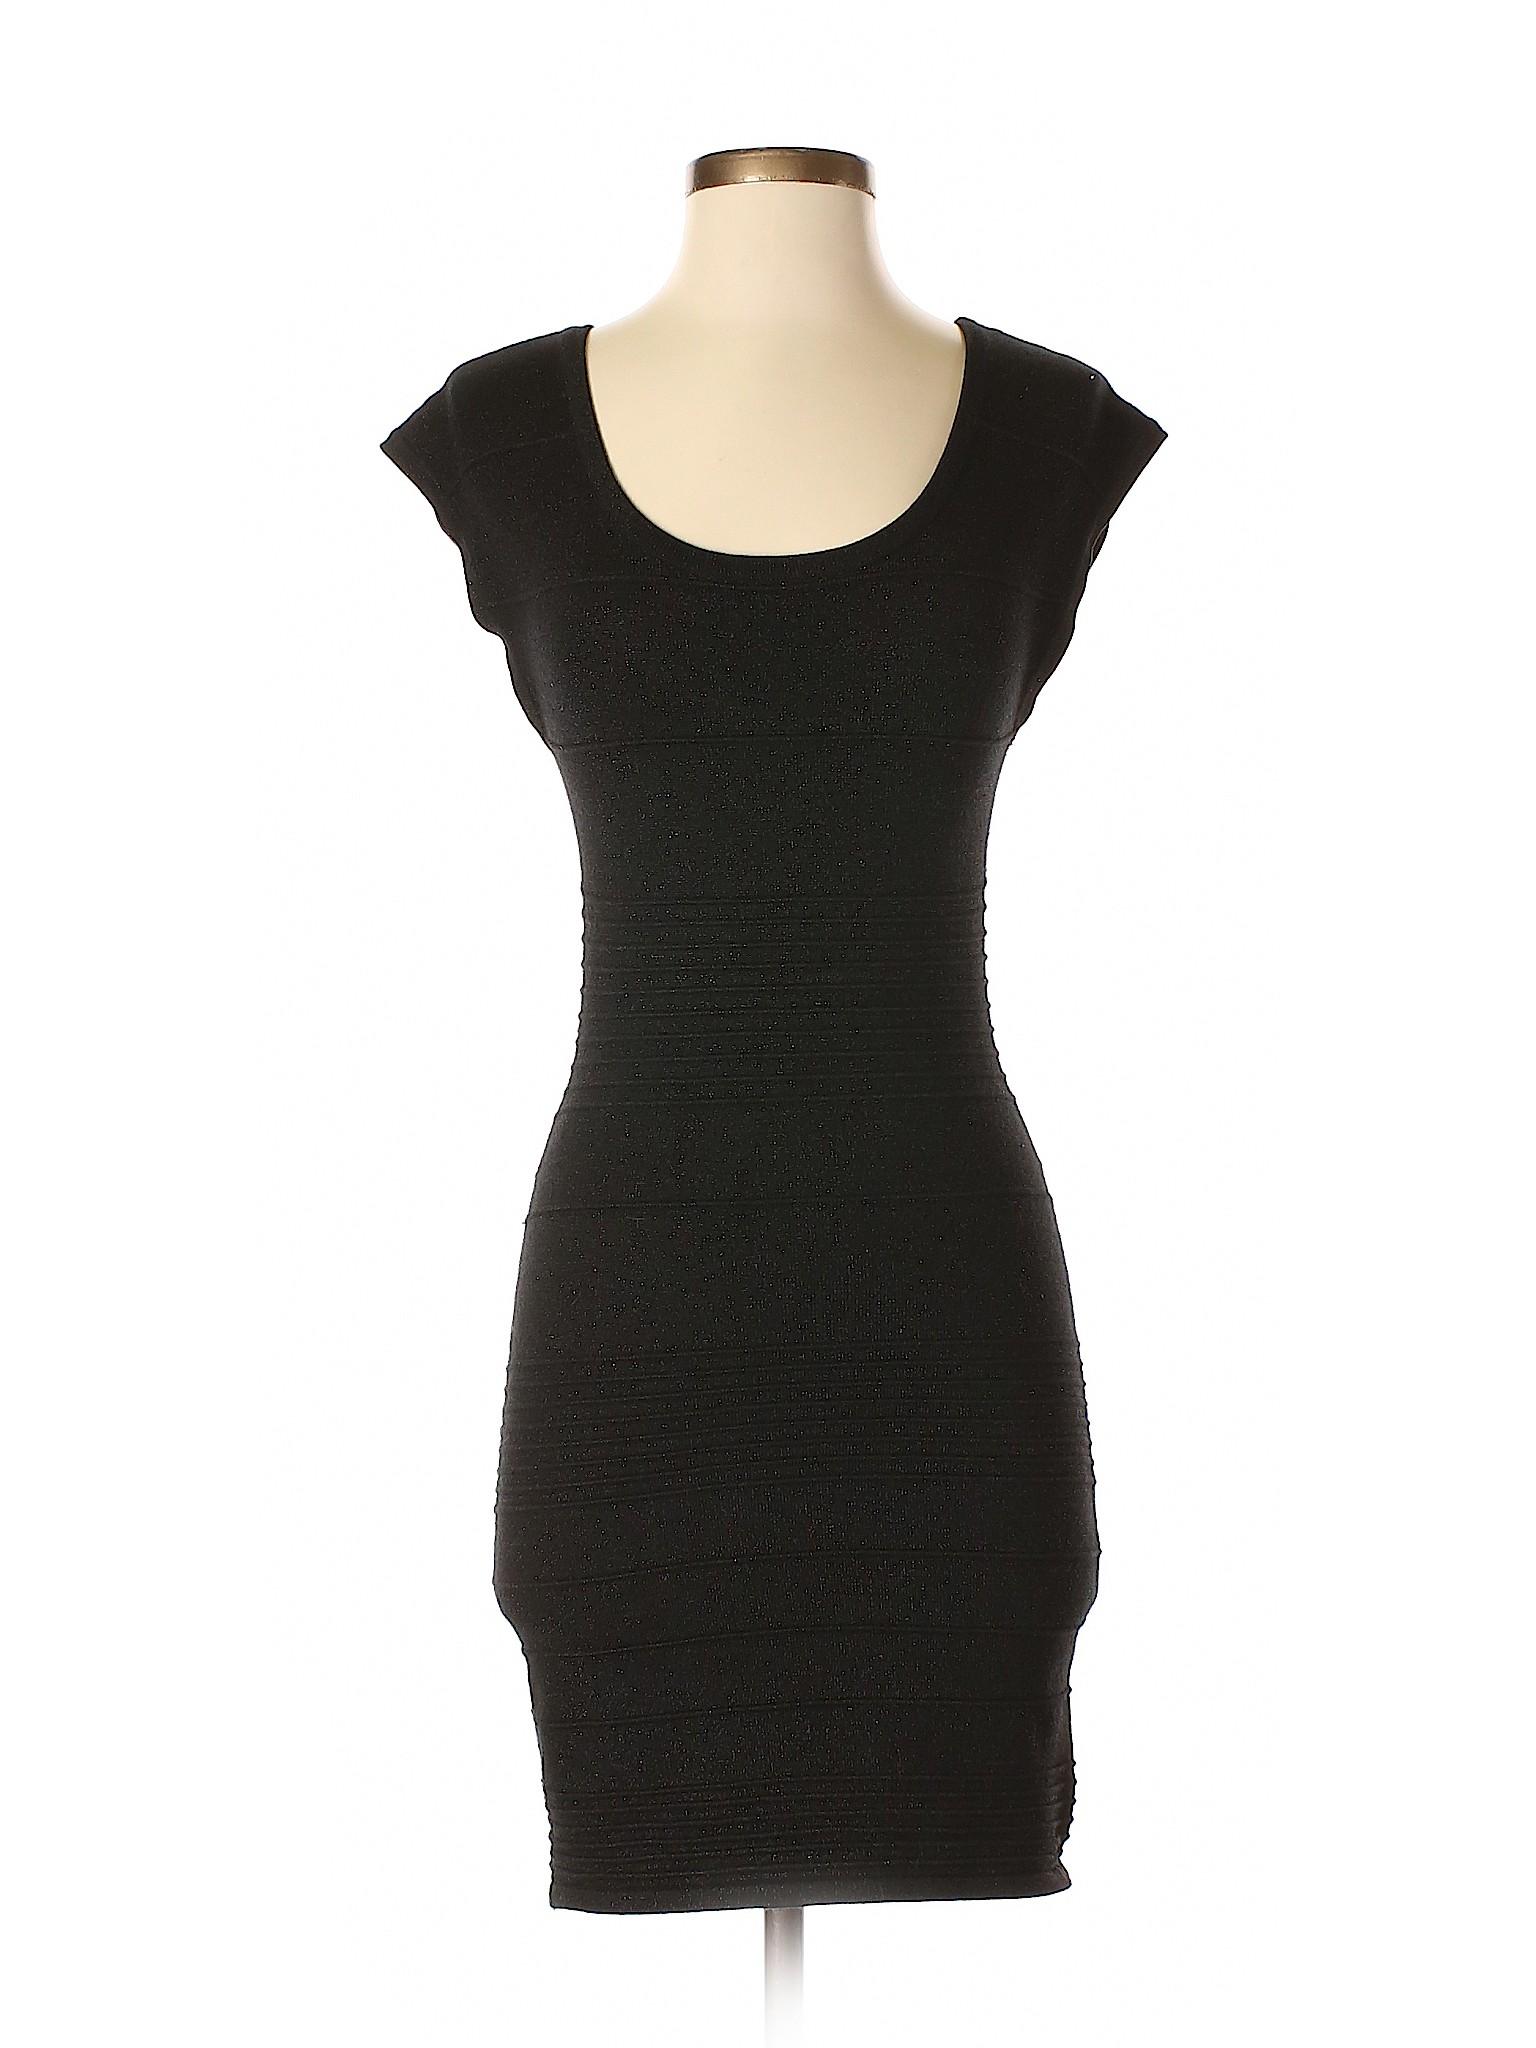 Casual One Twenty One Selling Dress Twenty Twenty Selling One Dress Casual Selling wwI7v